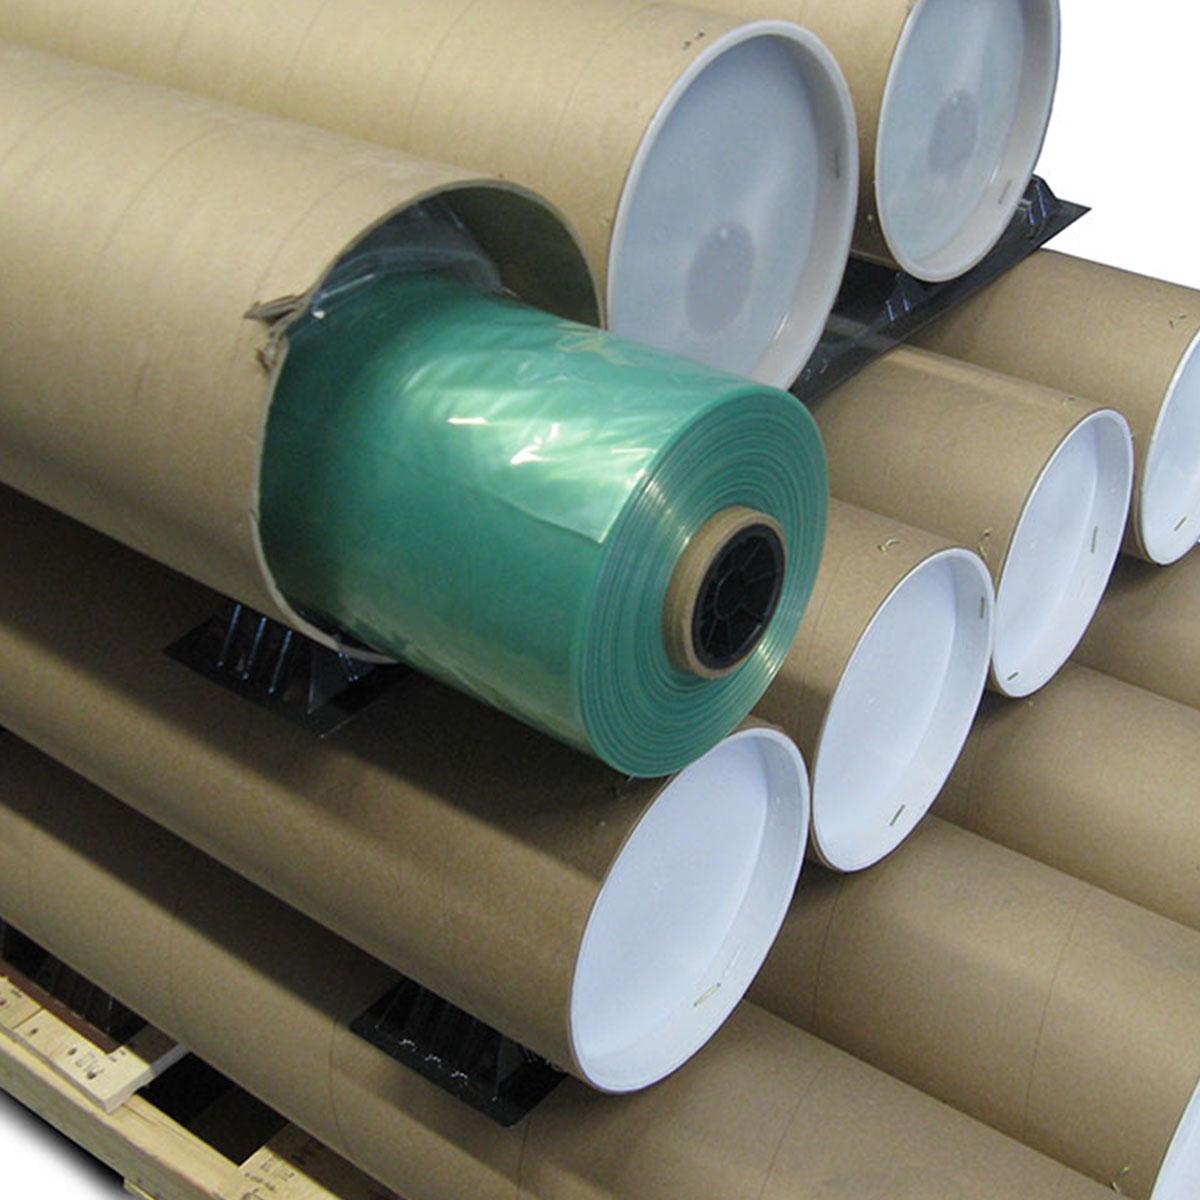 vakuum sack nylon 1000 grn 0076mm x 1000mm 440m 0003 x 40